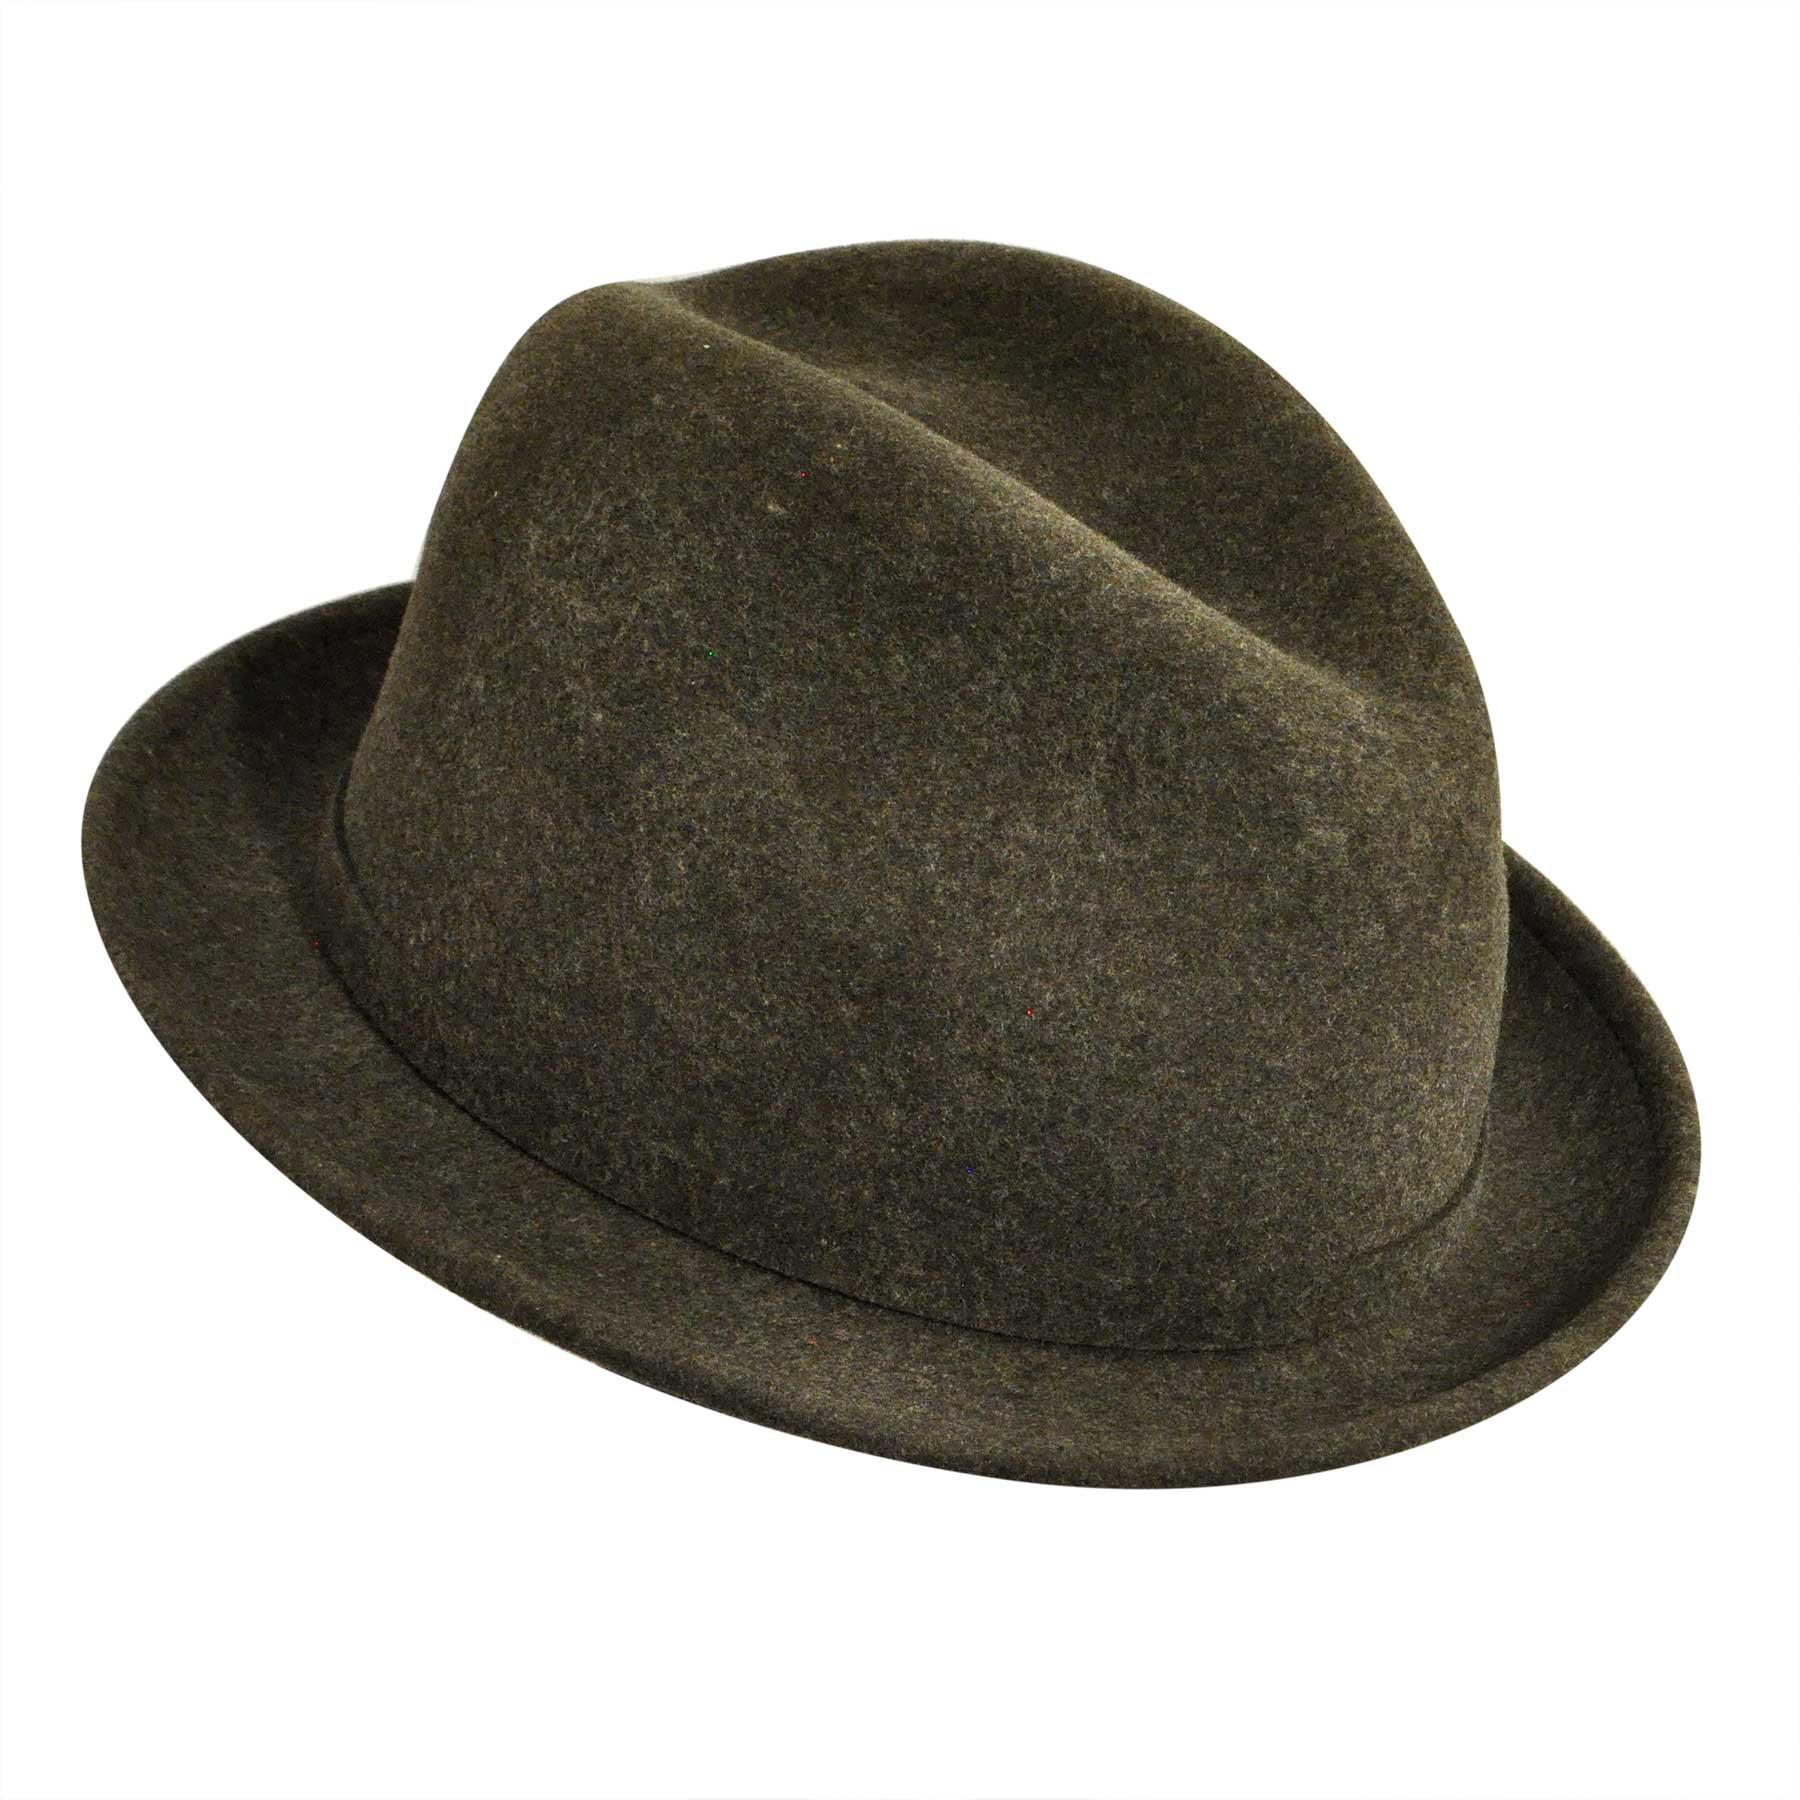 4e5b8e5a8c226 Pantropic - Pantropic Male Mens Litefeltâ® Charlie Stingy Brim Fedora Hat -  Walmart.com